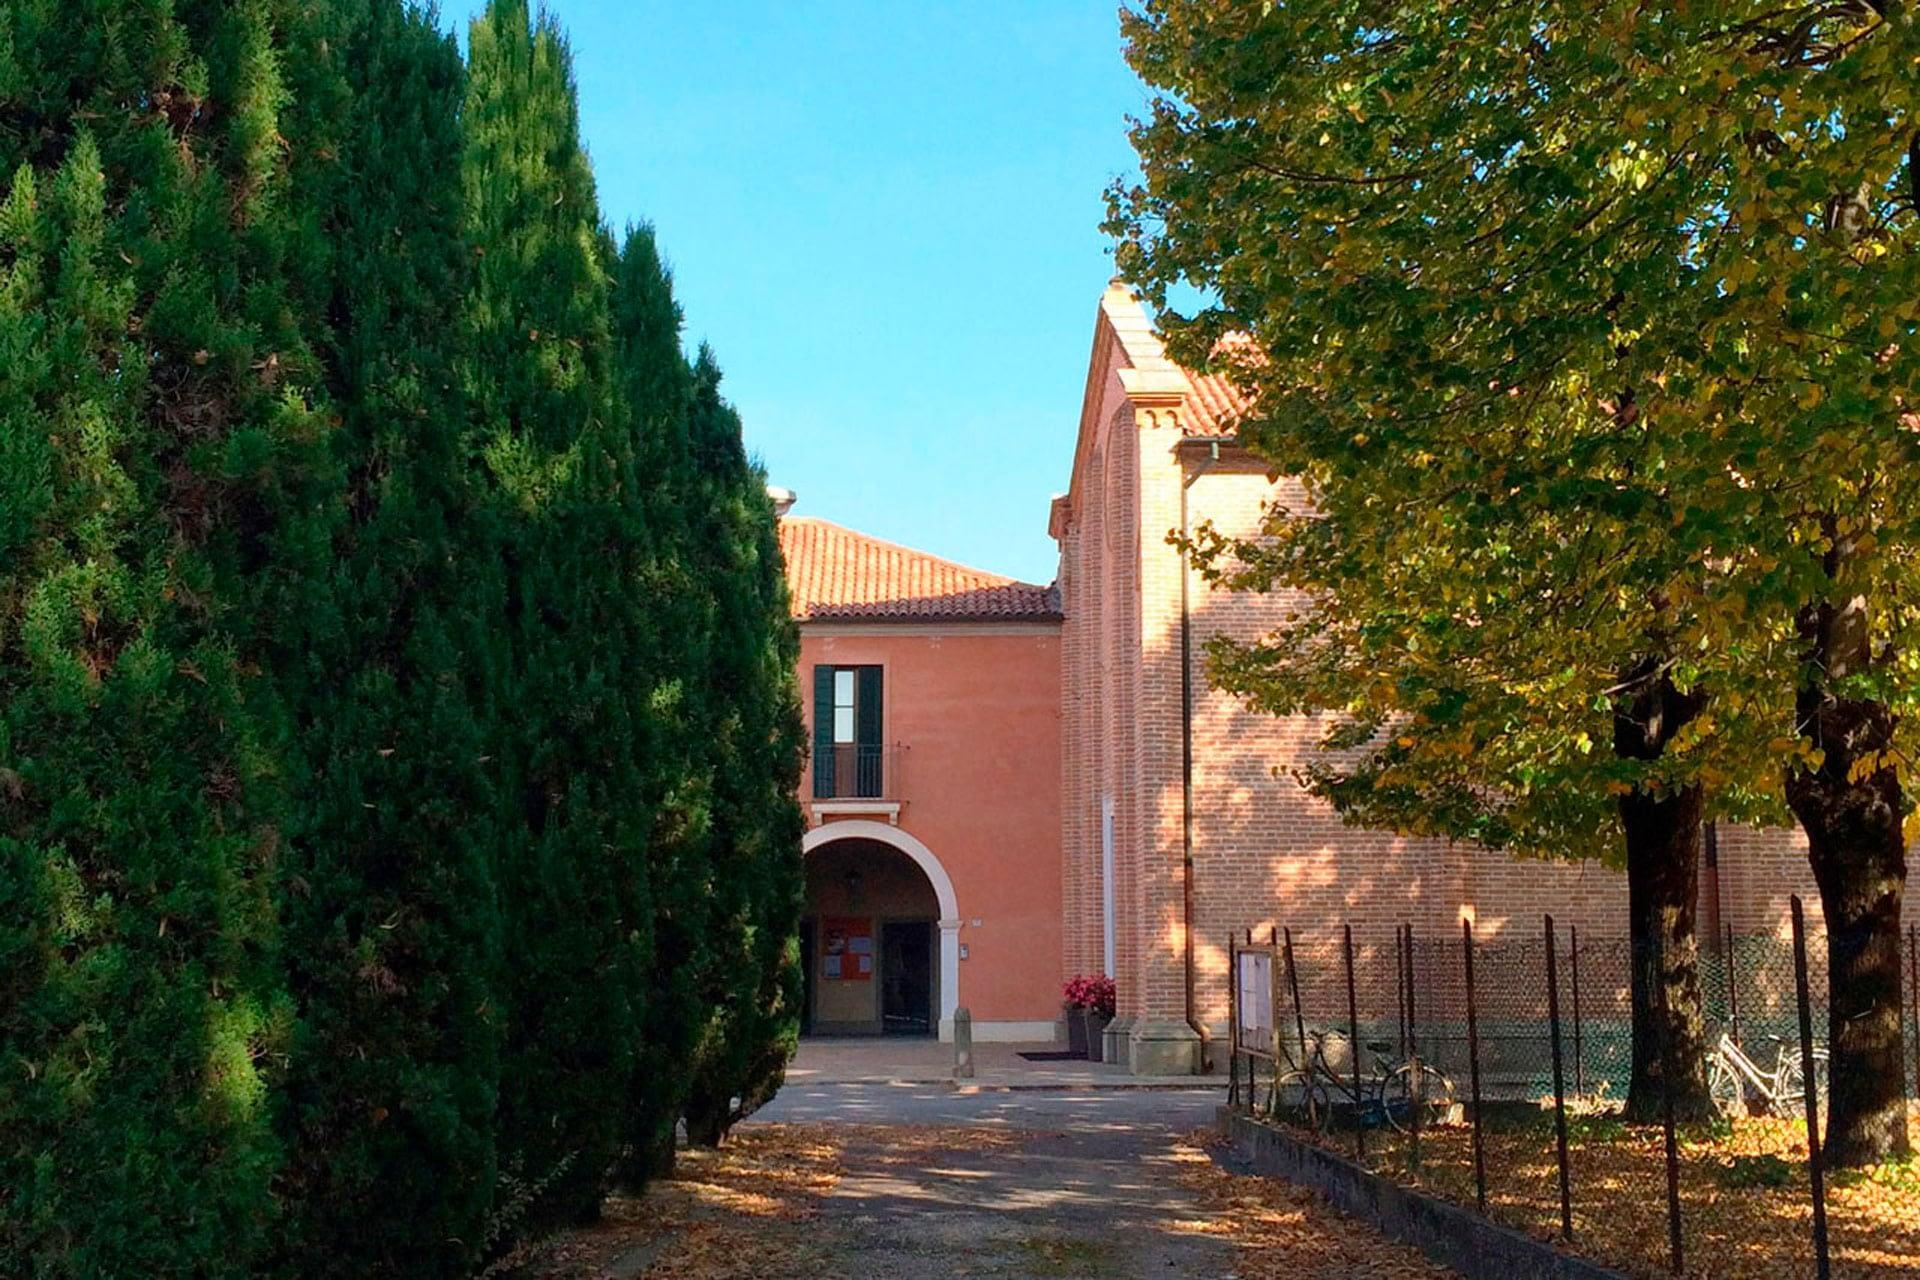 San Pietro Viminario_Scorcio della Chiesa